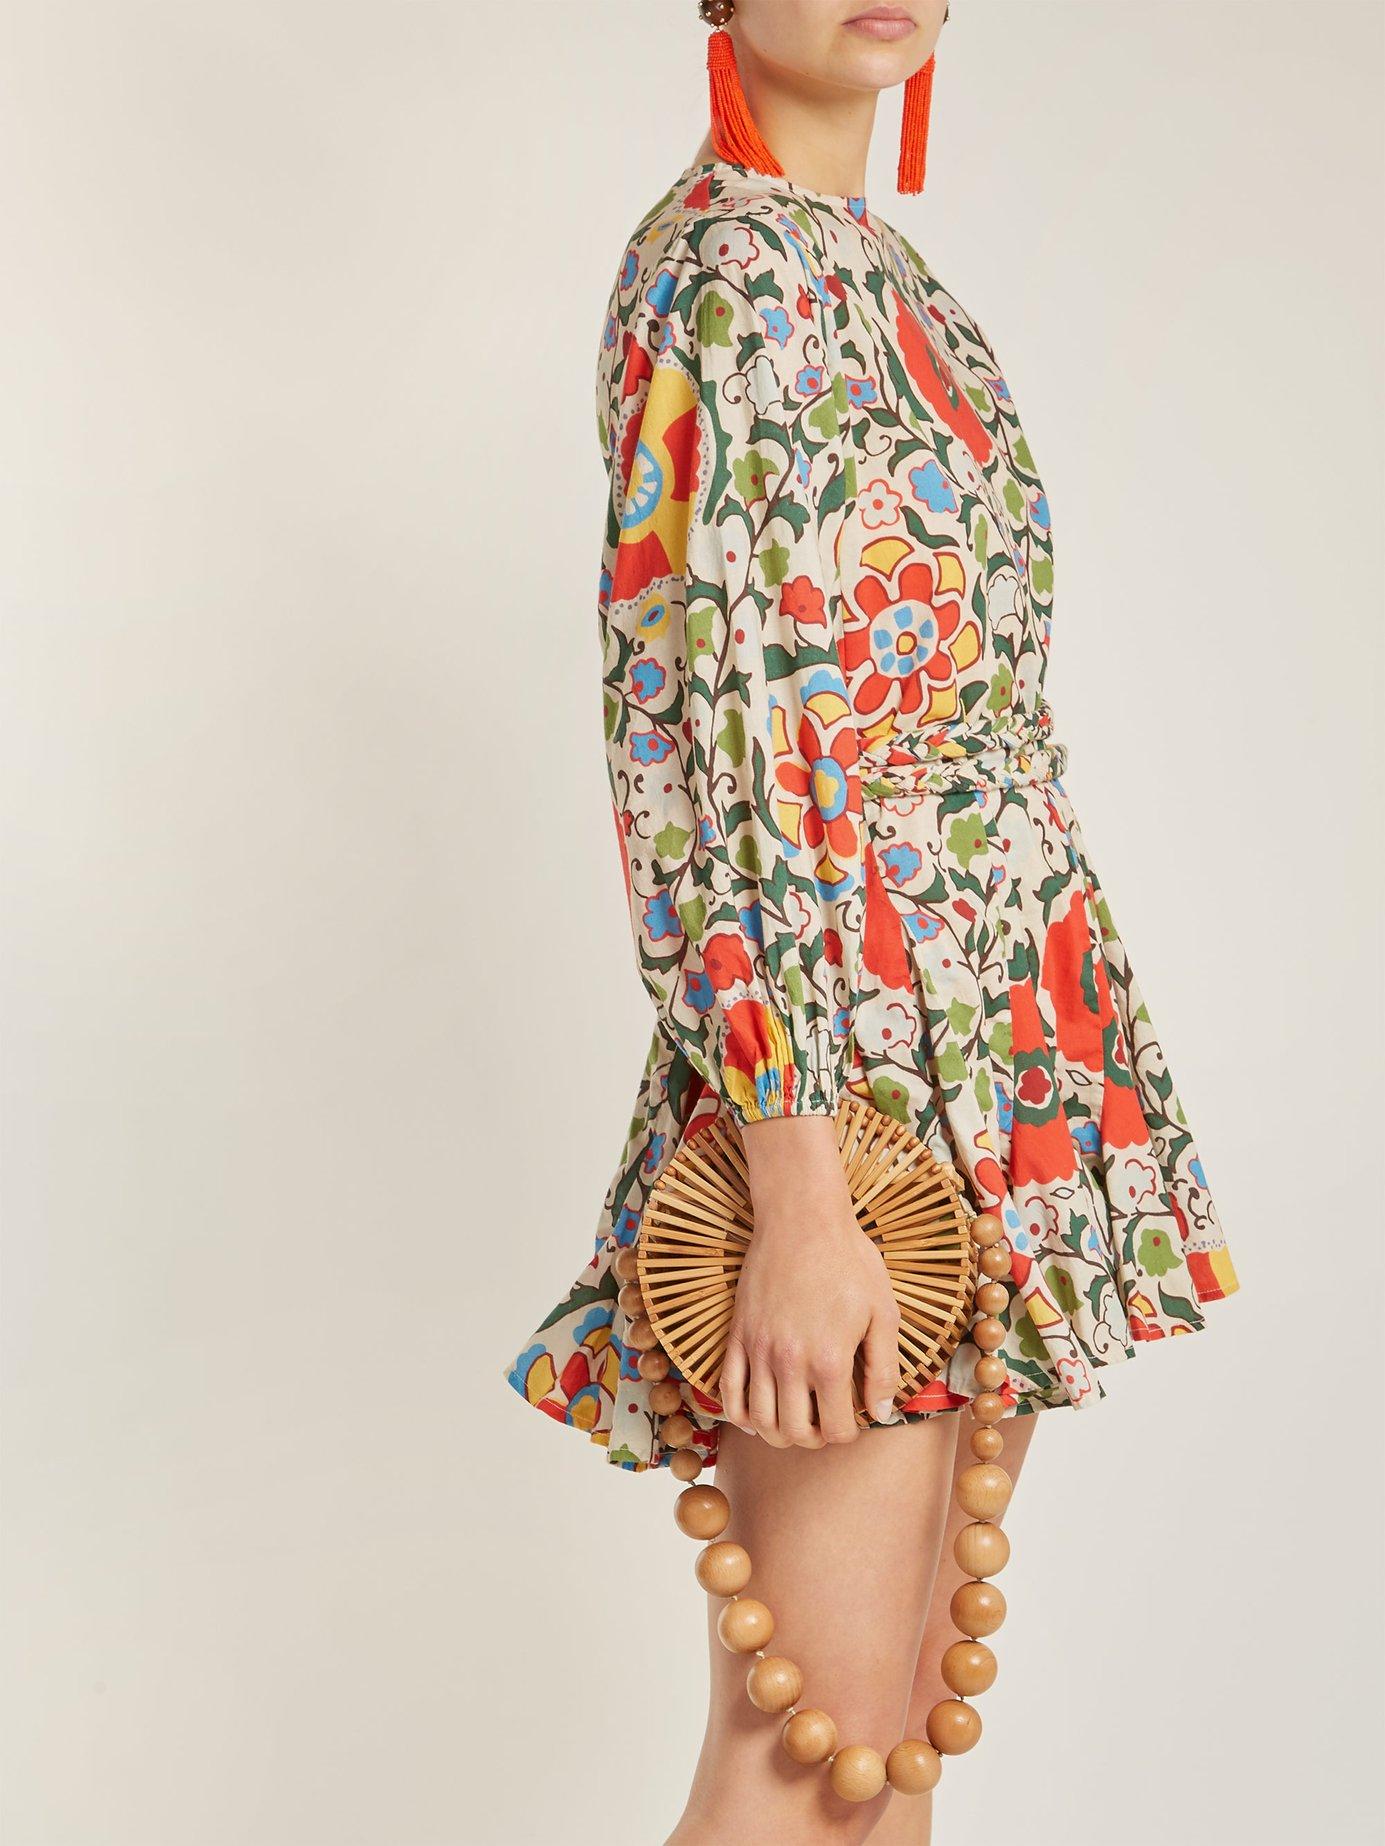 Ella floral-print cotton dress by Rhode Resort